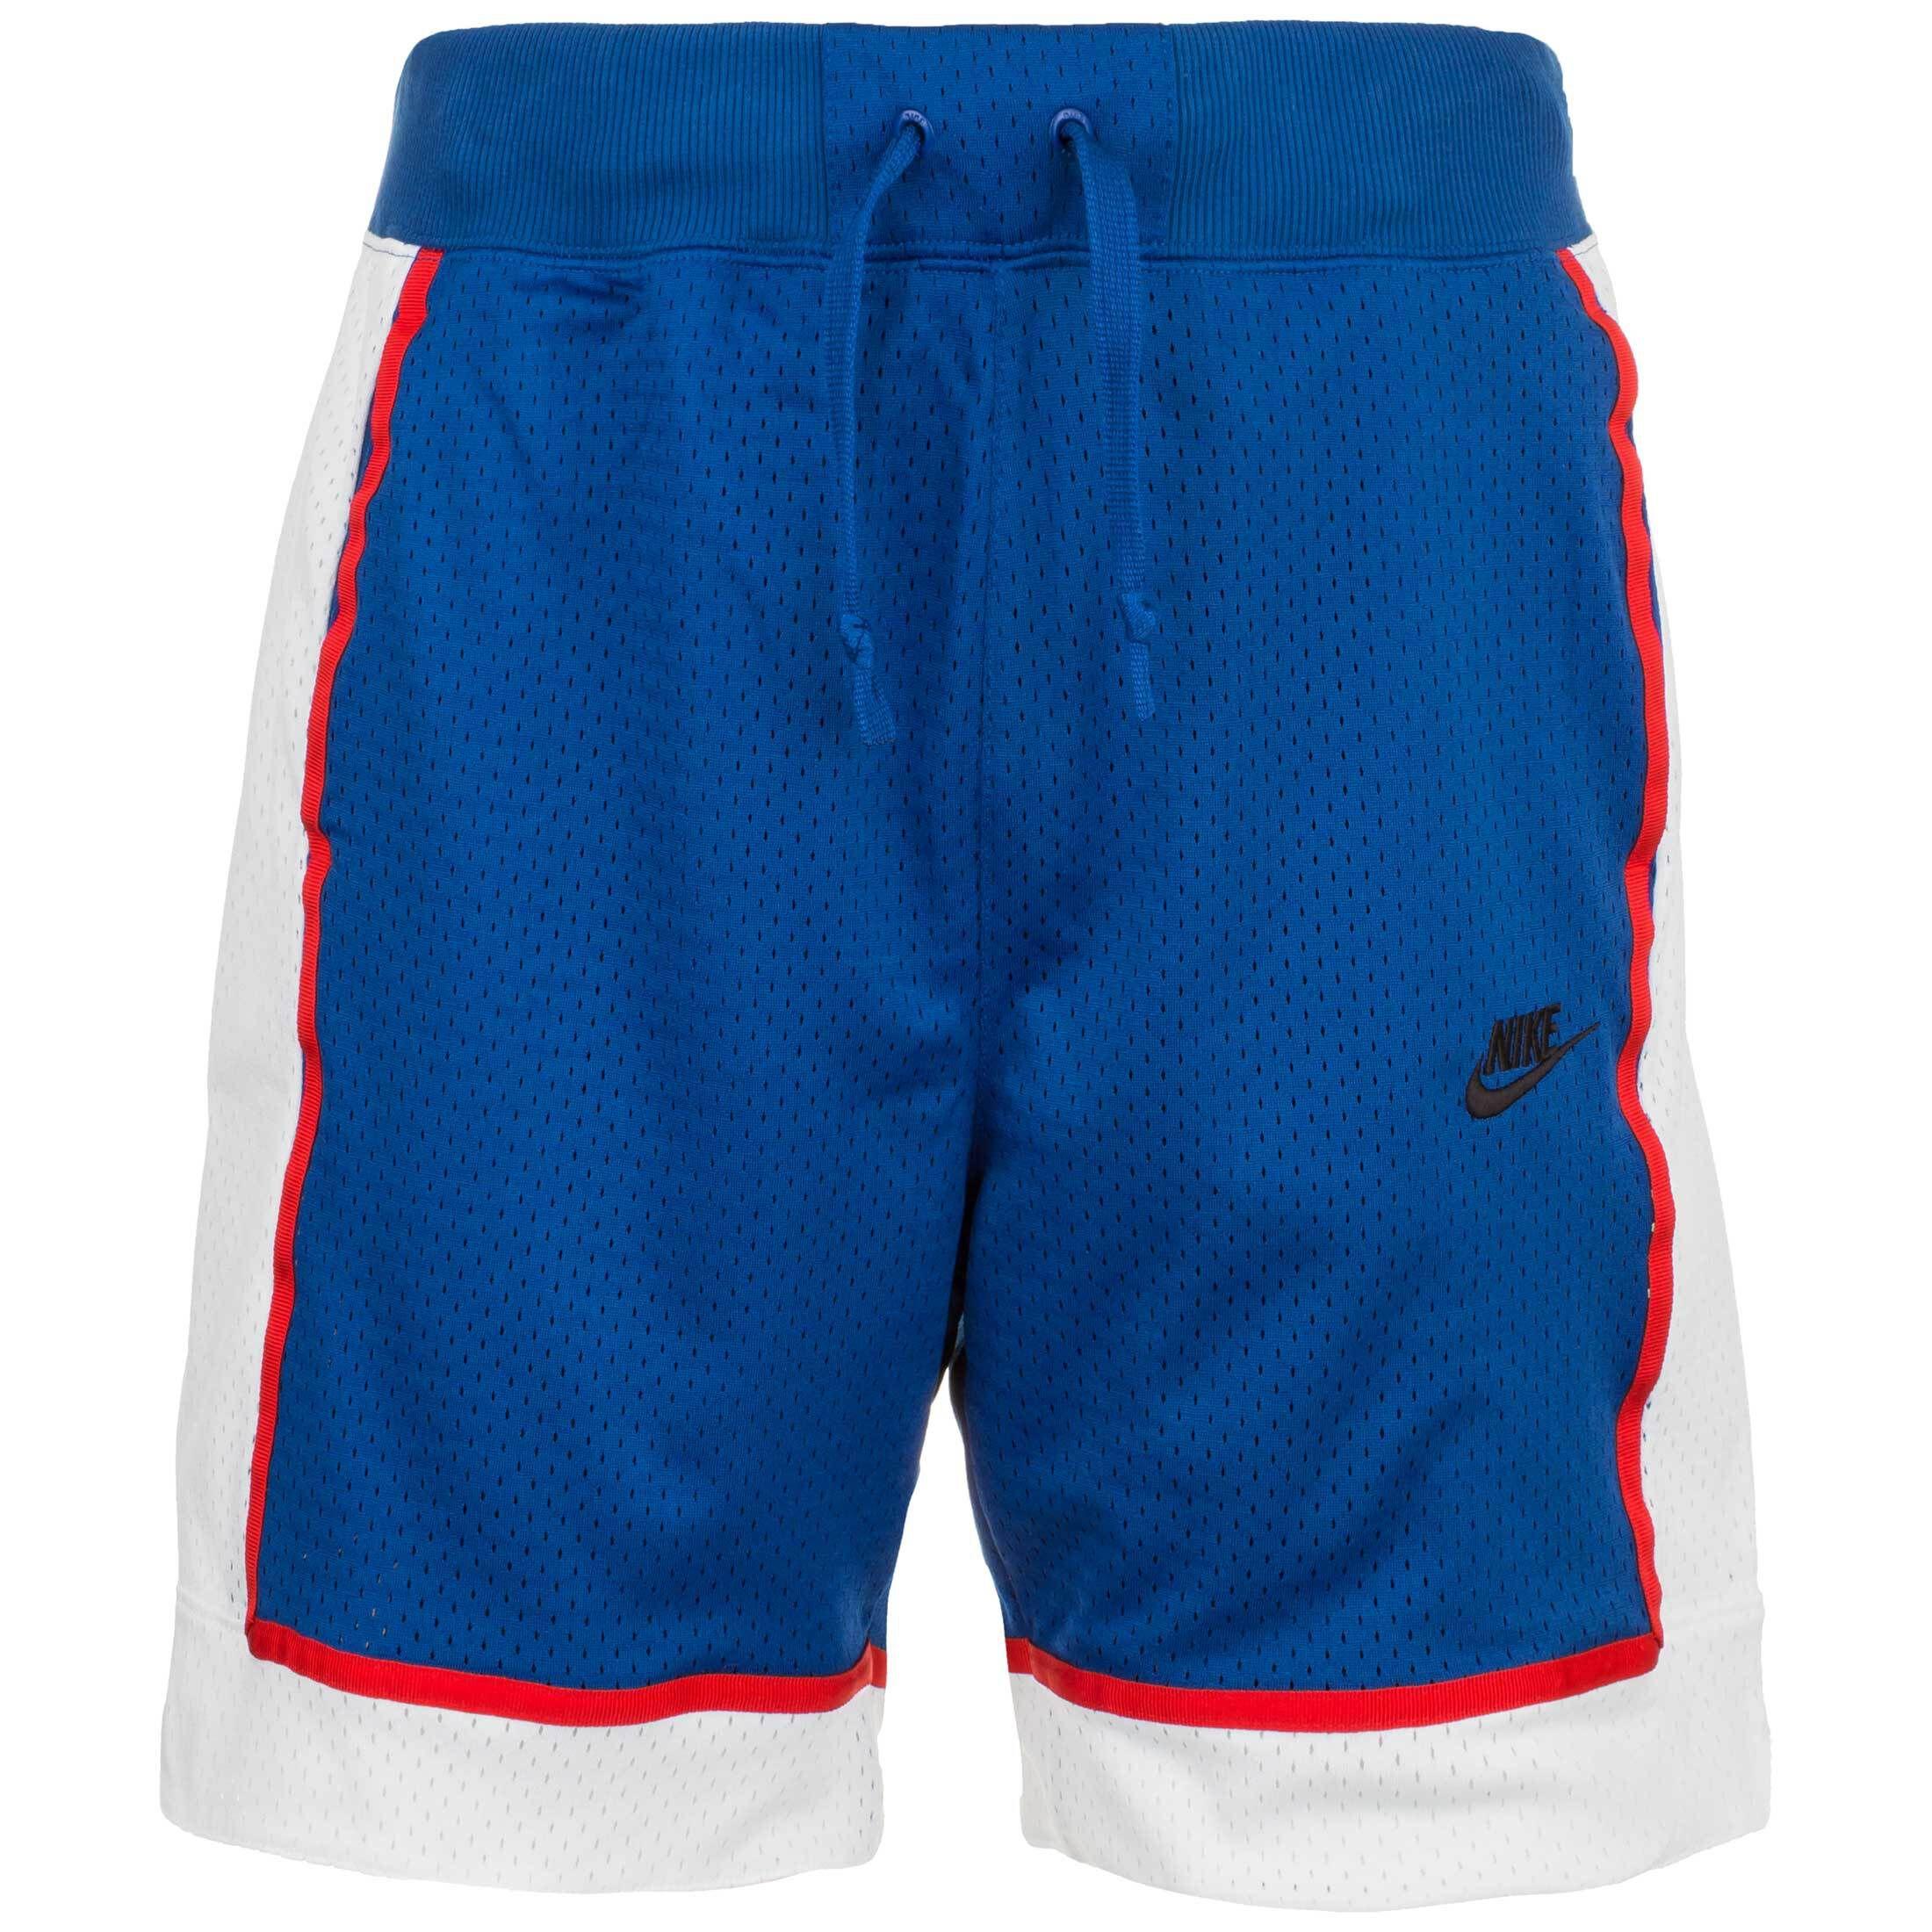 Nike Sportswear Statement Mesh Short Herren bei OUTFITTER